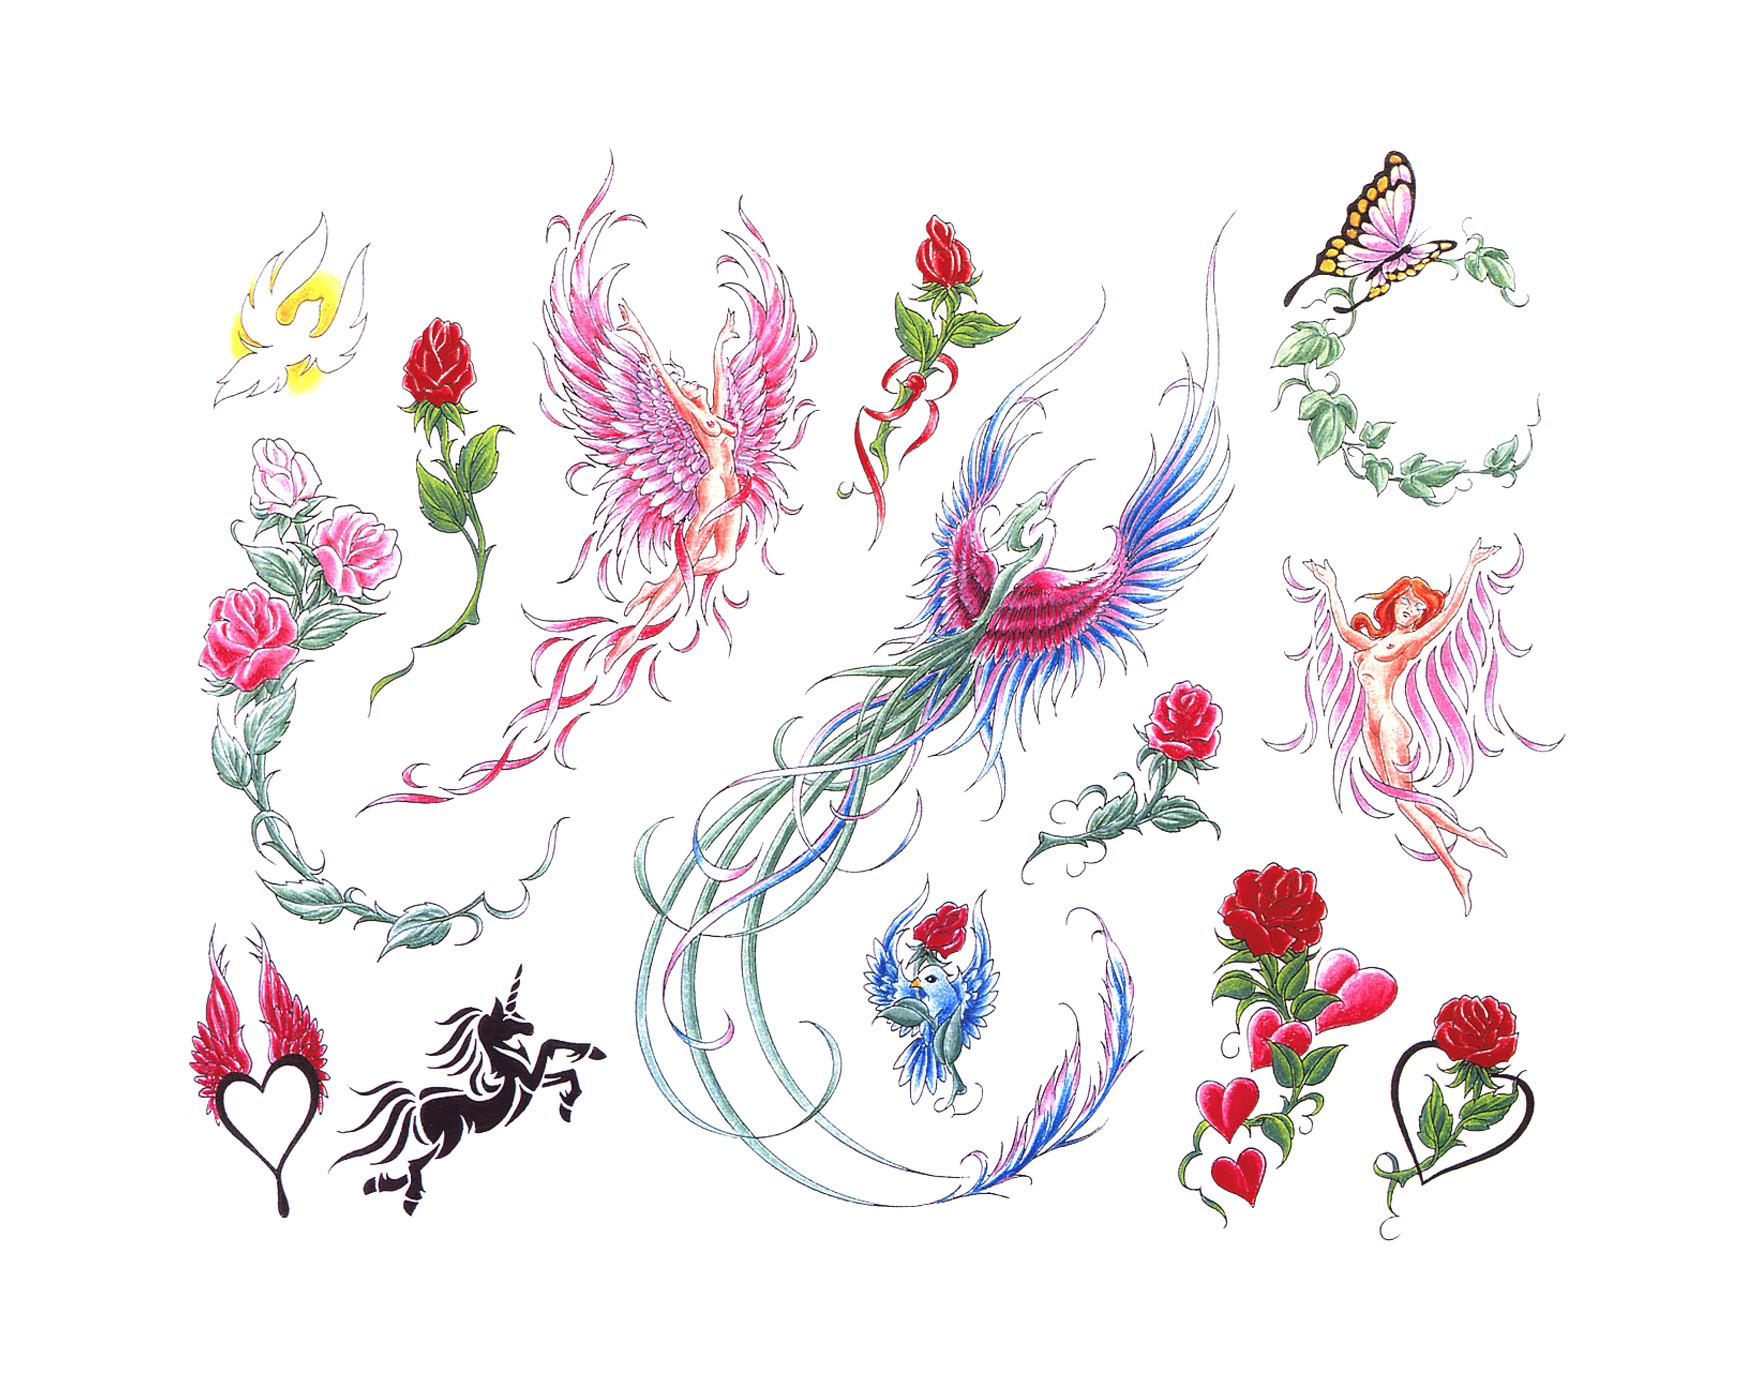 Vine Flower Erfly Tattoo Designs Flowers Healthy